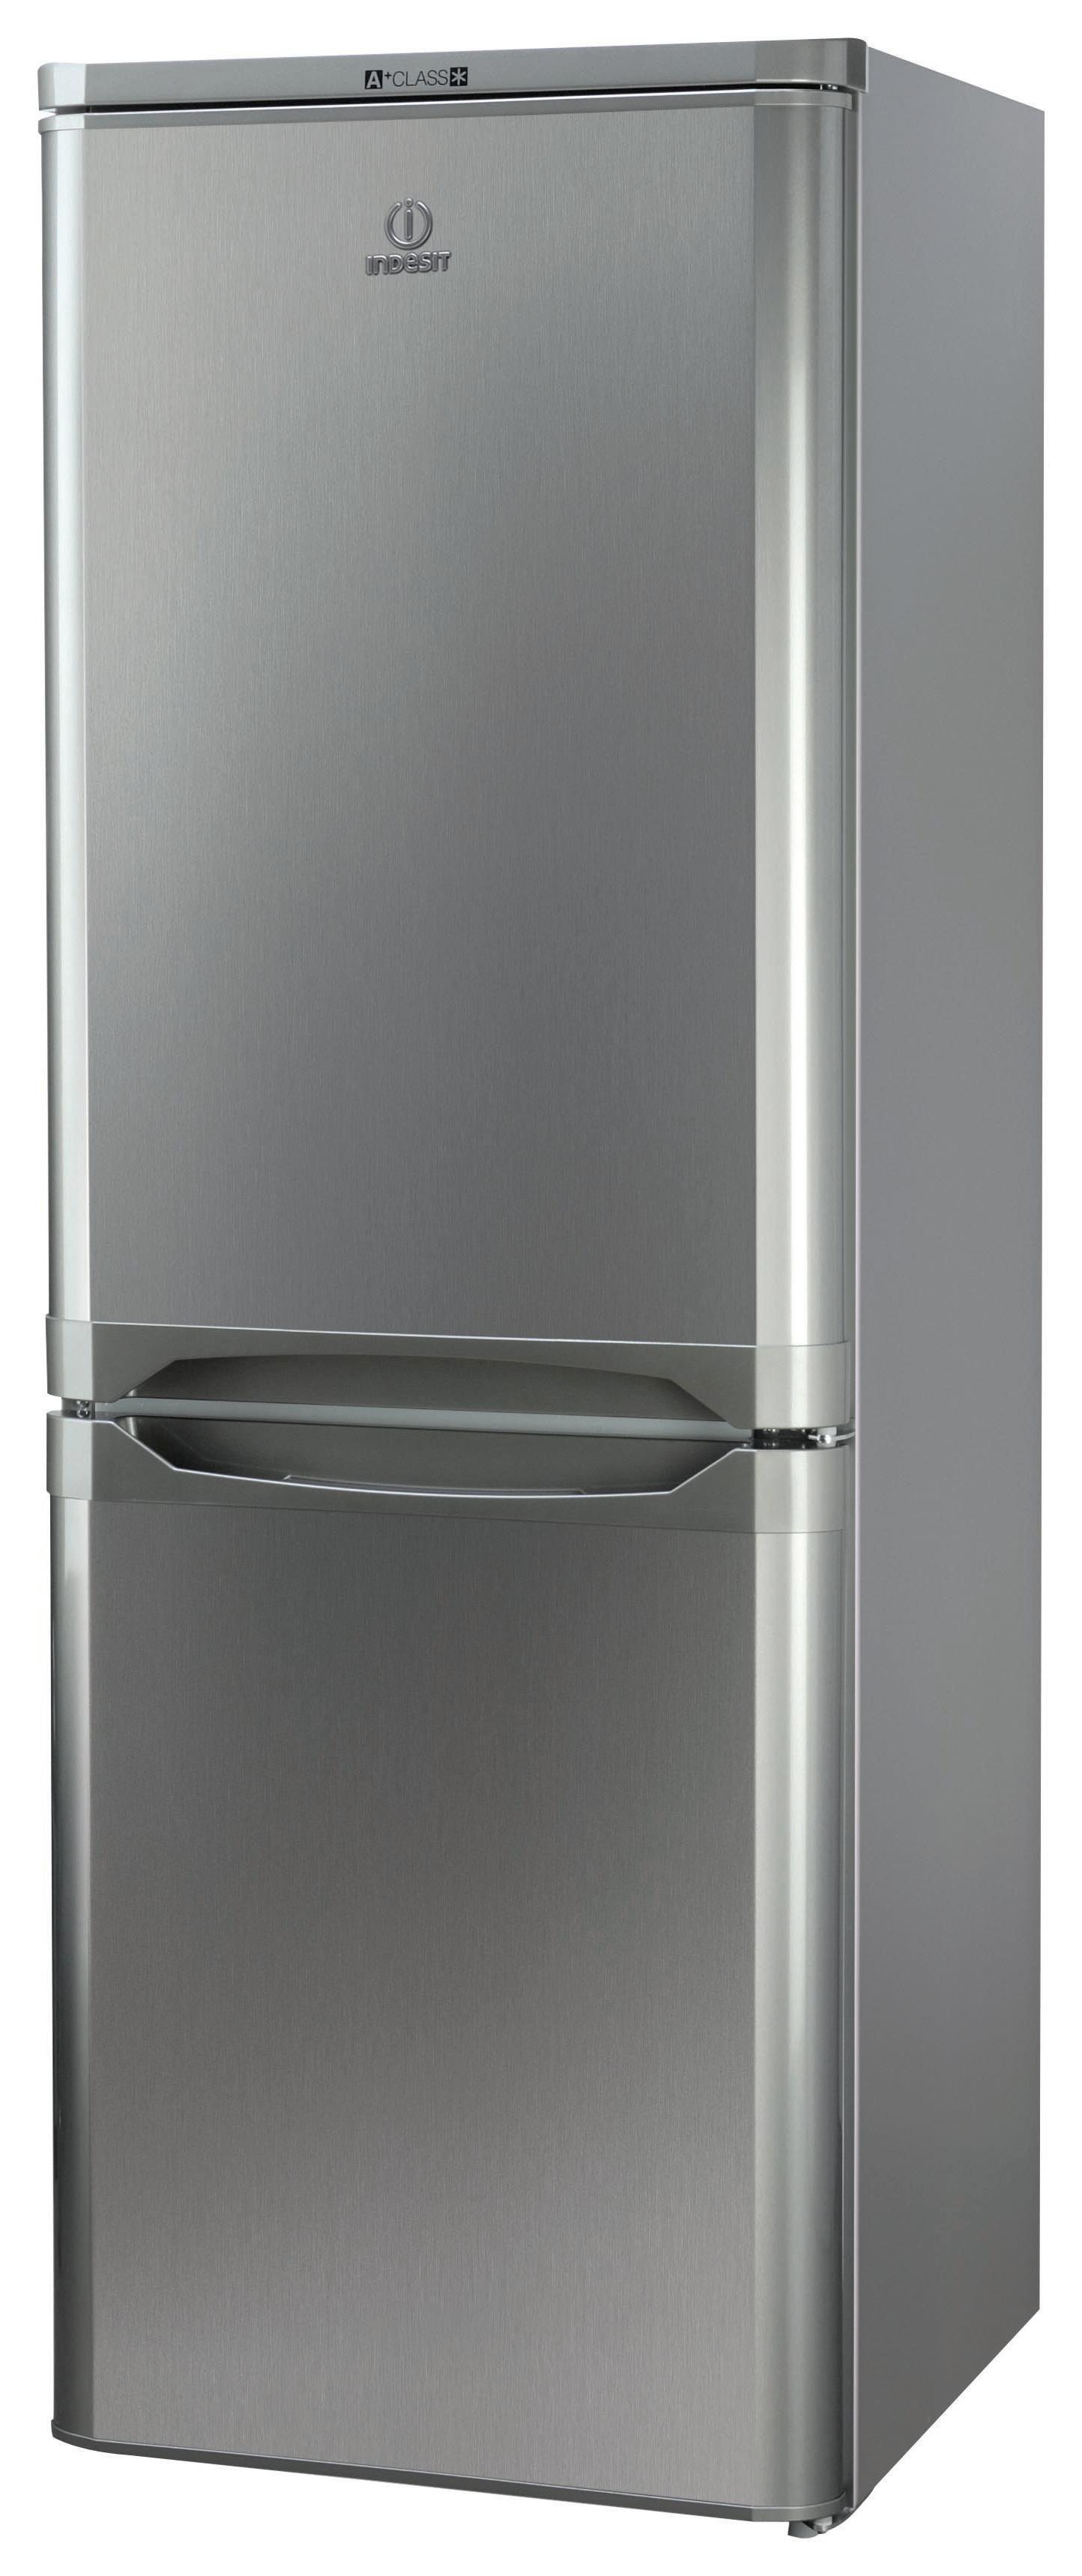 Kühlschrank Kombi : Indesit kühl gefrier kombi ncaa nx online kaufen ➤ möbelix